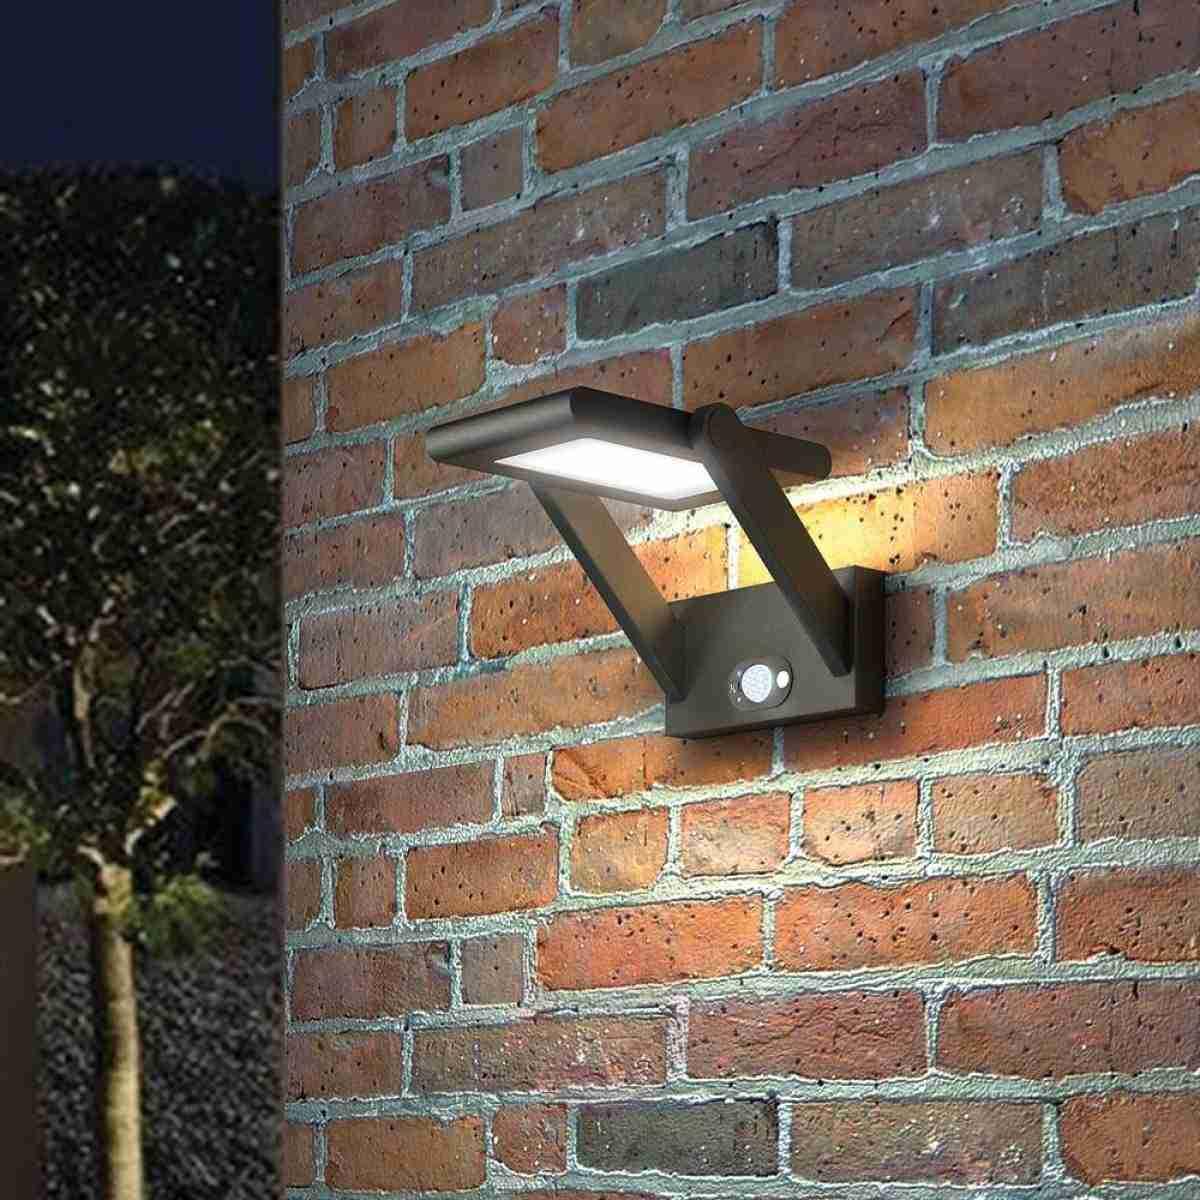 Luces solares para iluminar los espacios exteriores 27